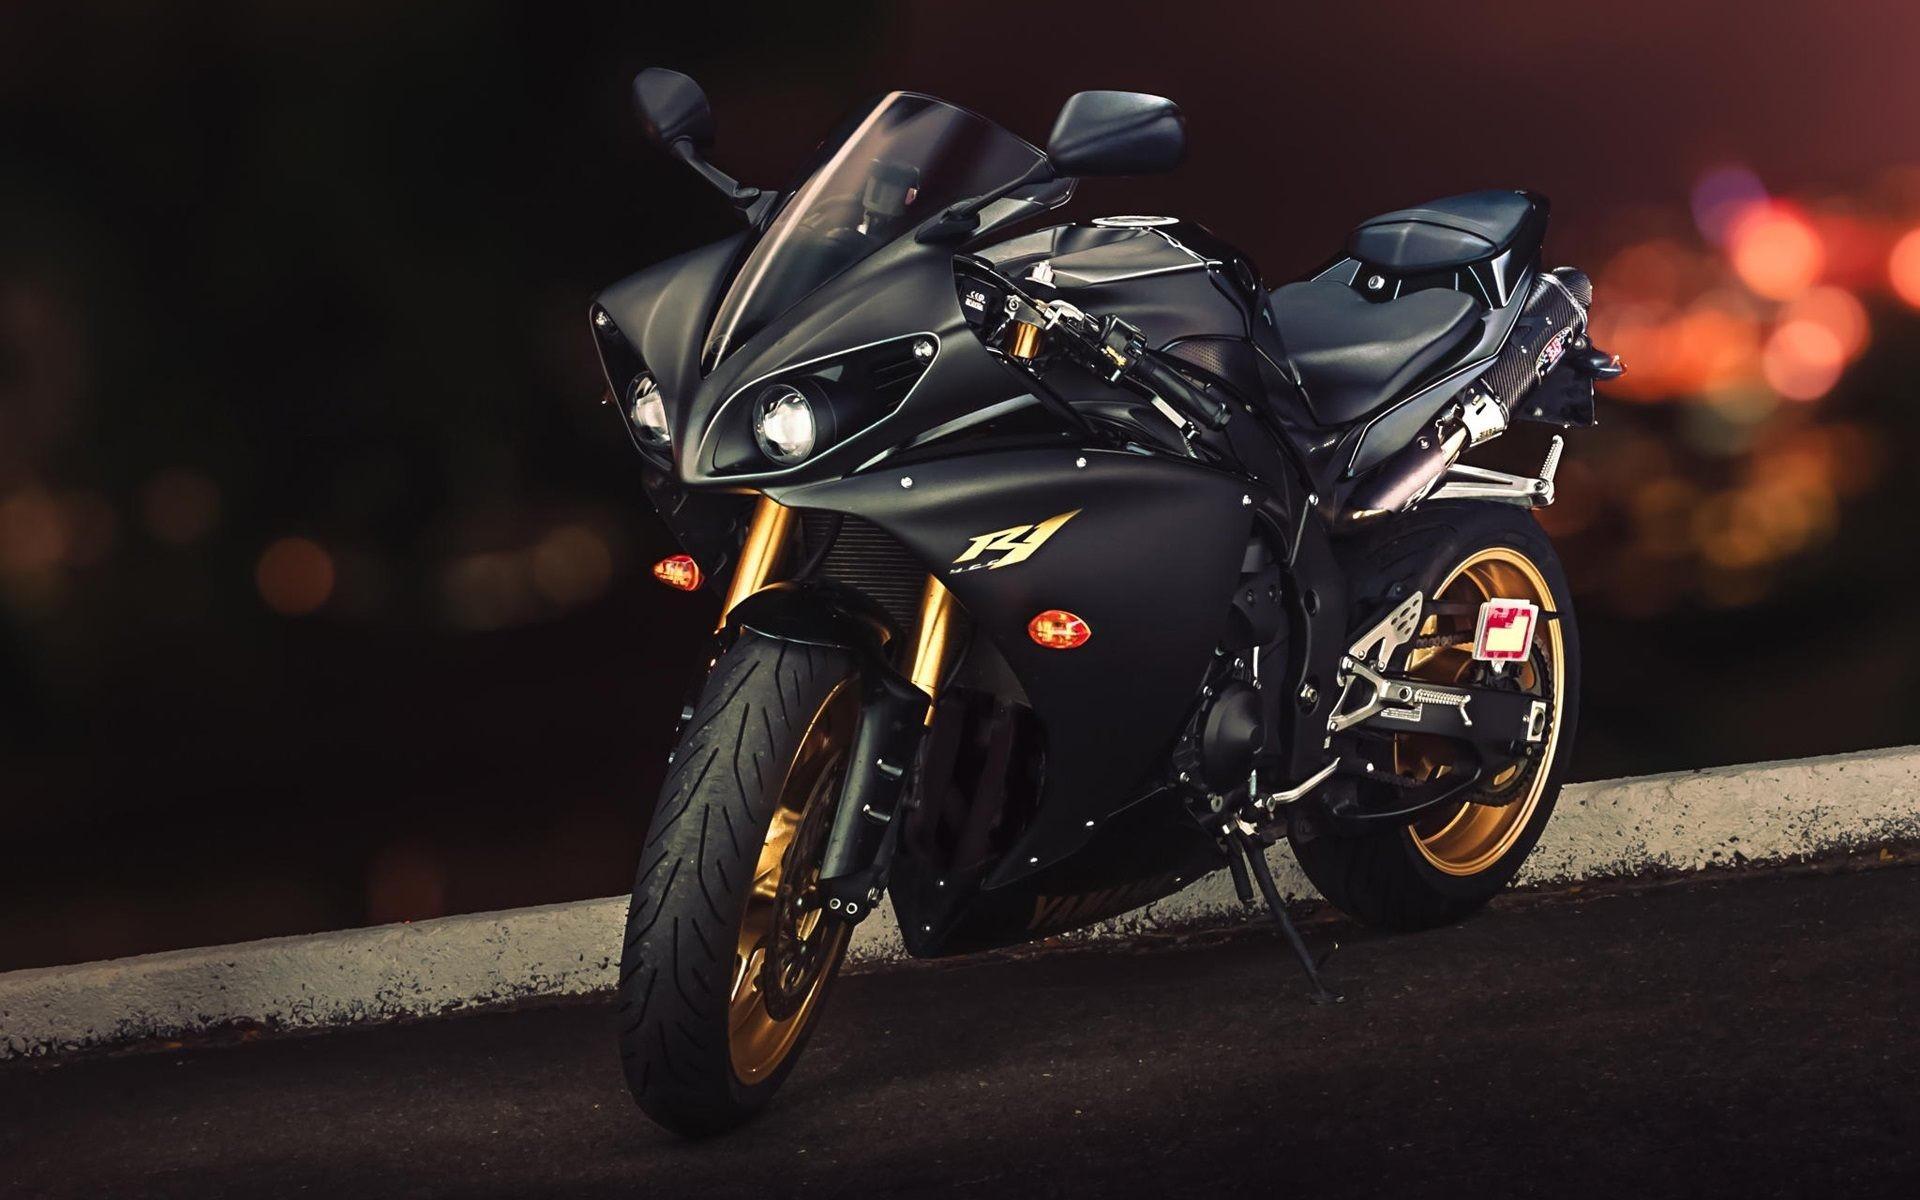 2014x1343 City Biker Girl Motorbike Harley Davidson Hd Wallpaper 1855983